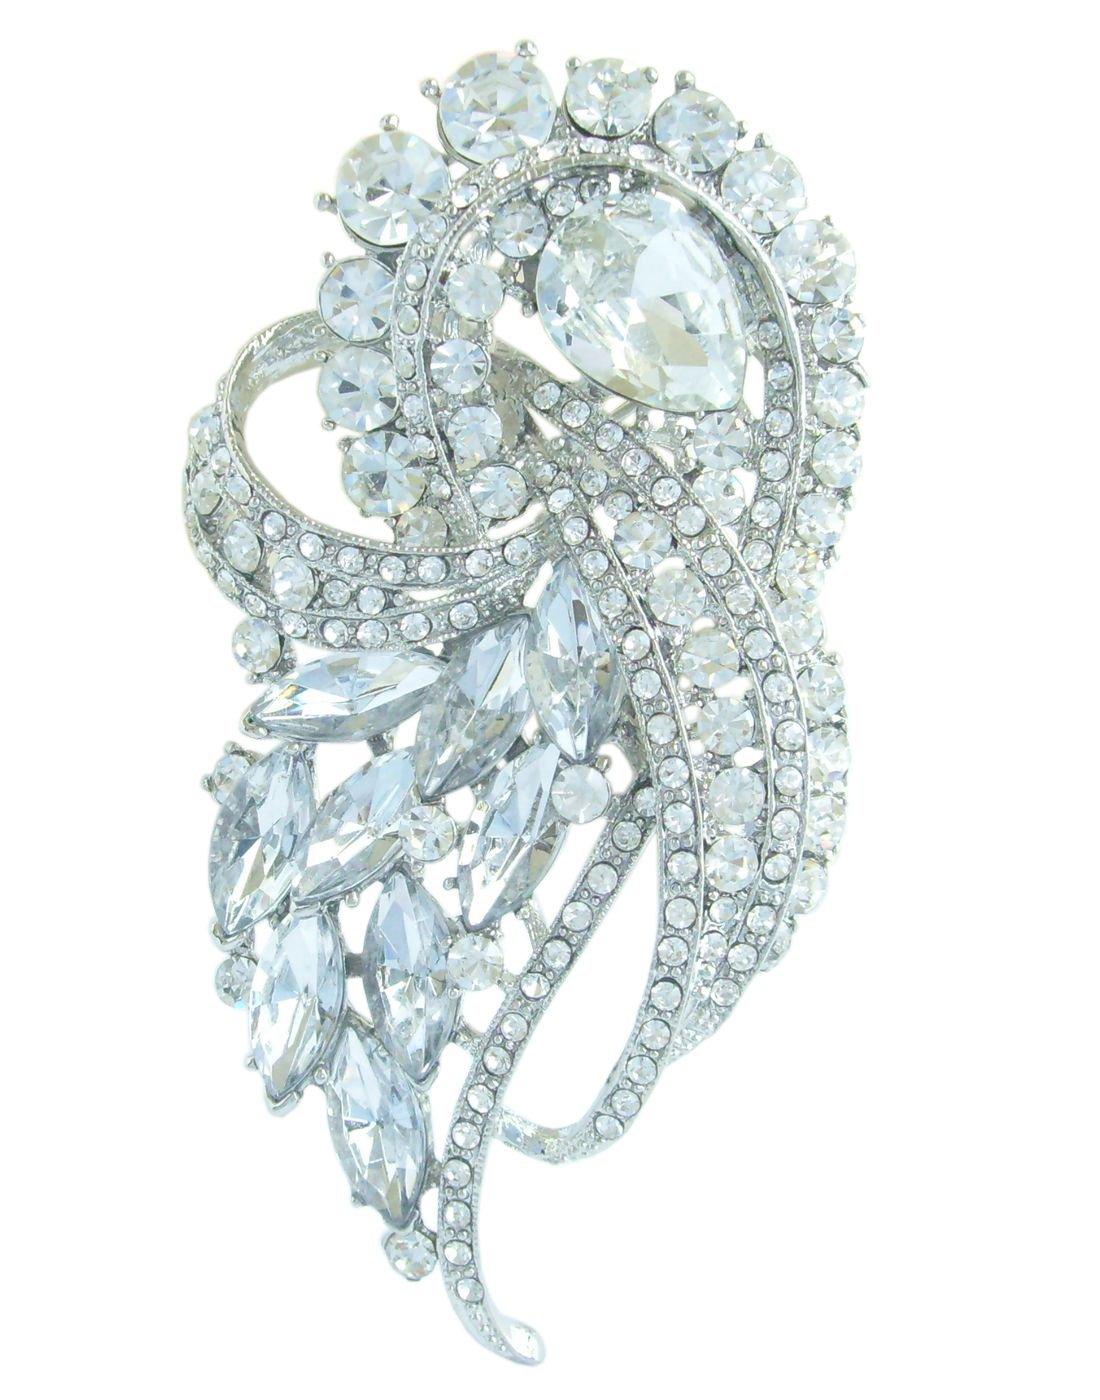 Sindary Pretty 3.74'' Rhinestone Crystal Bowknot Brooch Pin Pendant BZ4243 (Silver-Tone Clear)